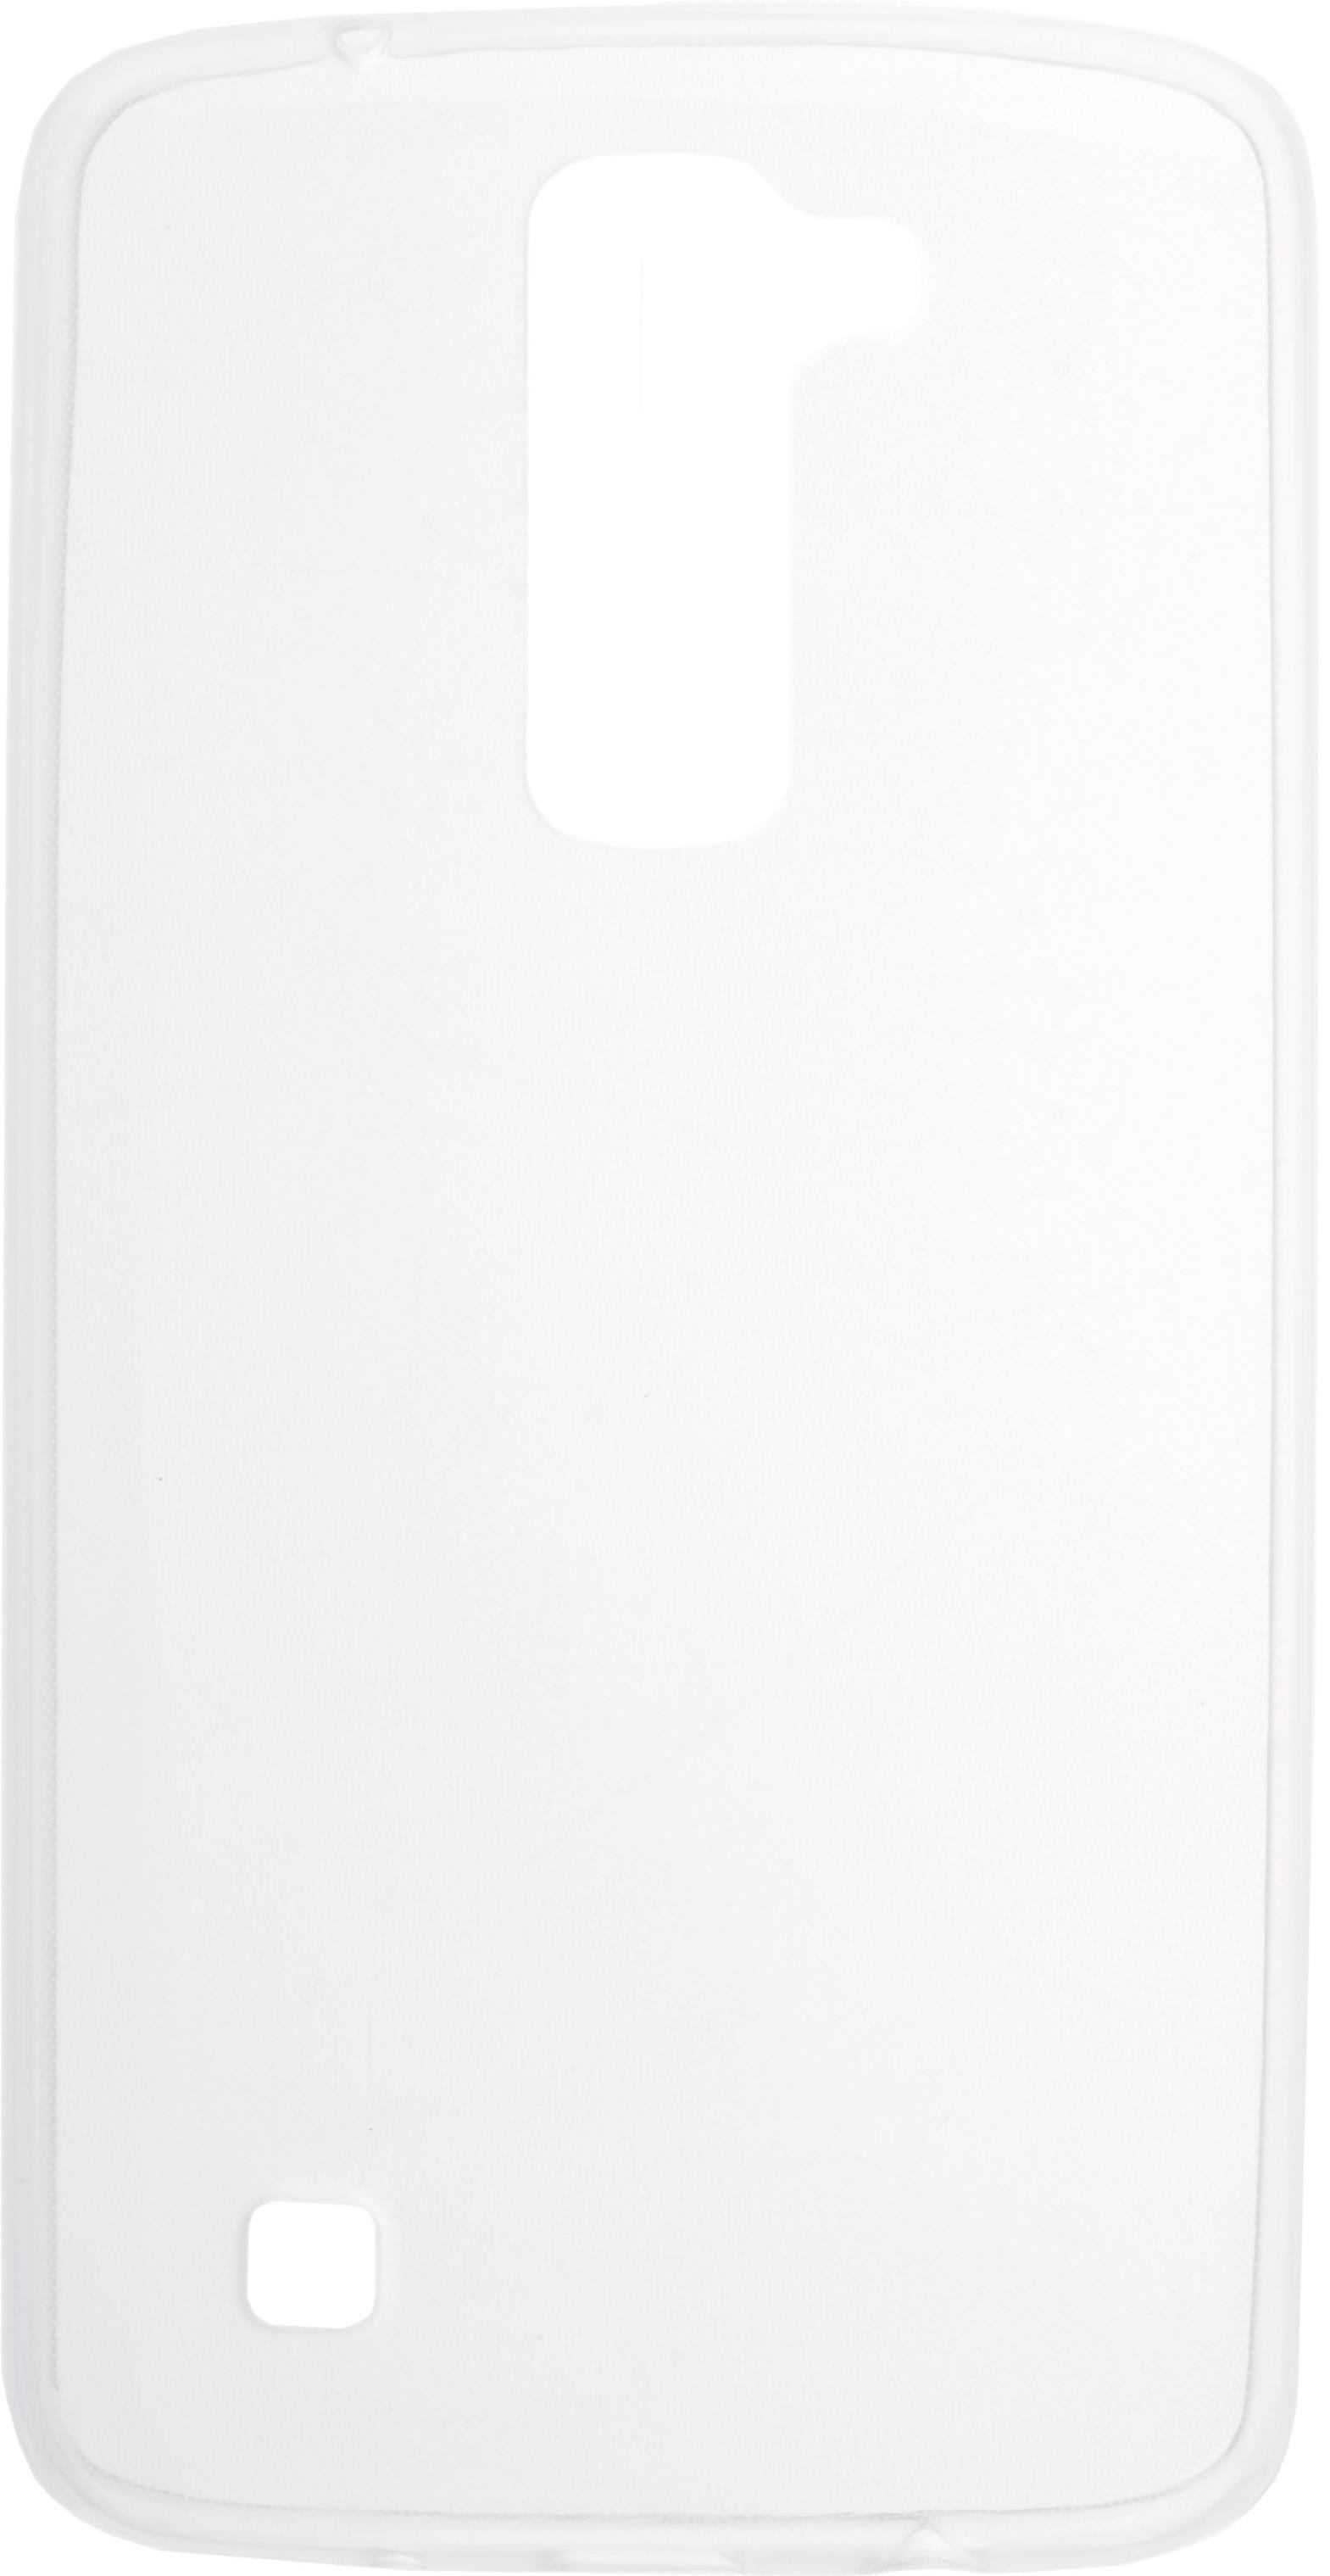 Чехол для сотового телефона skinBOX Slim Silicone, 4630042528178, прозрачный чехол для xiaomi redmi pro skinbox 4people slim silicone case прозрачный